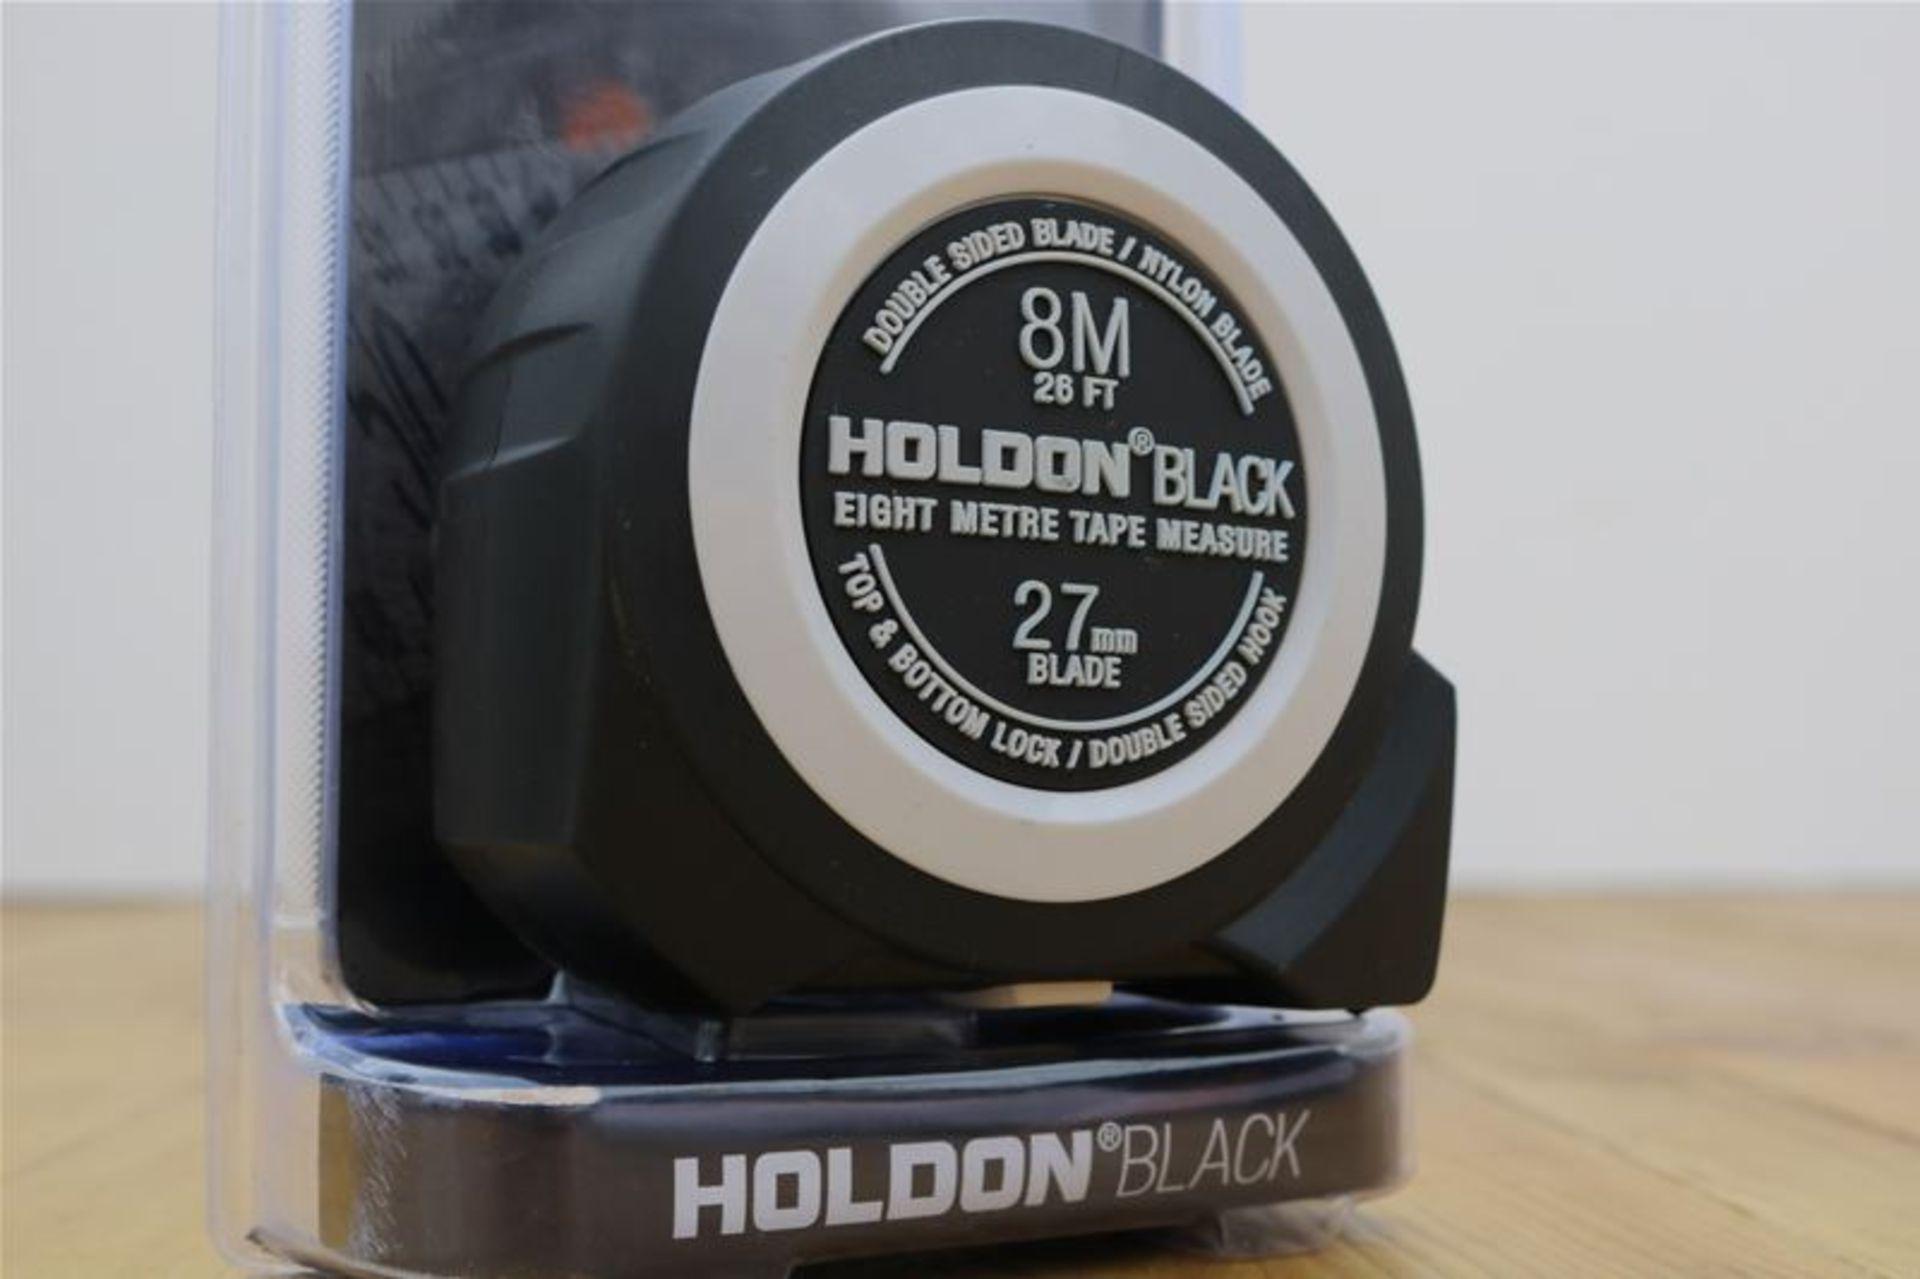 Lot 21 - 10 x HOLDON BLACK Heavy Duty 8M Tape Measure